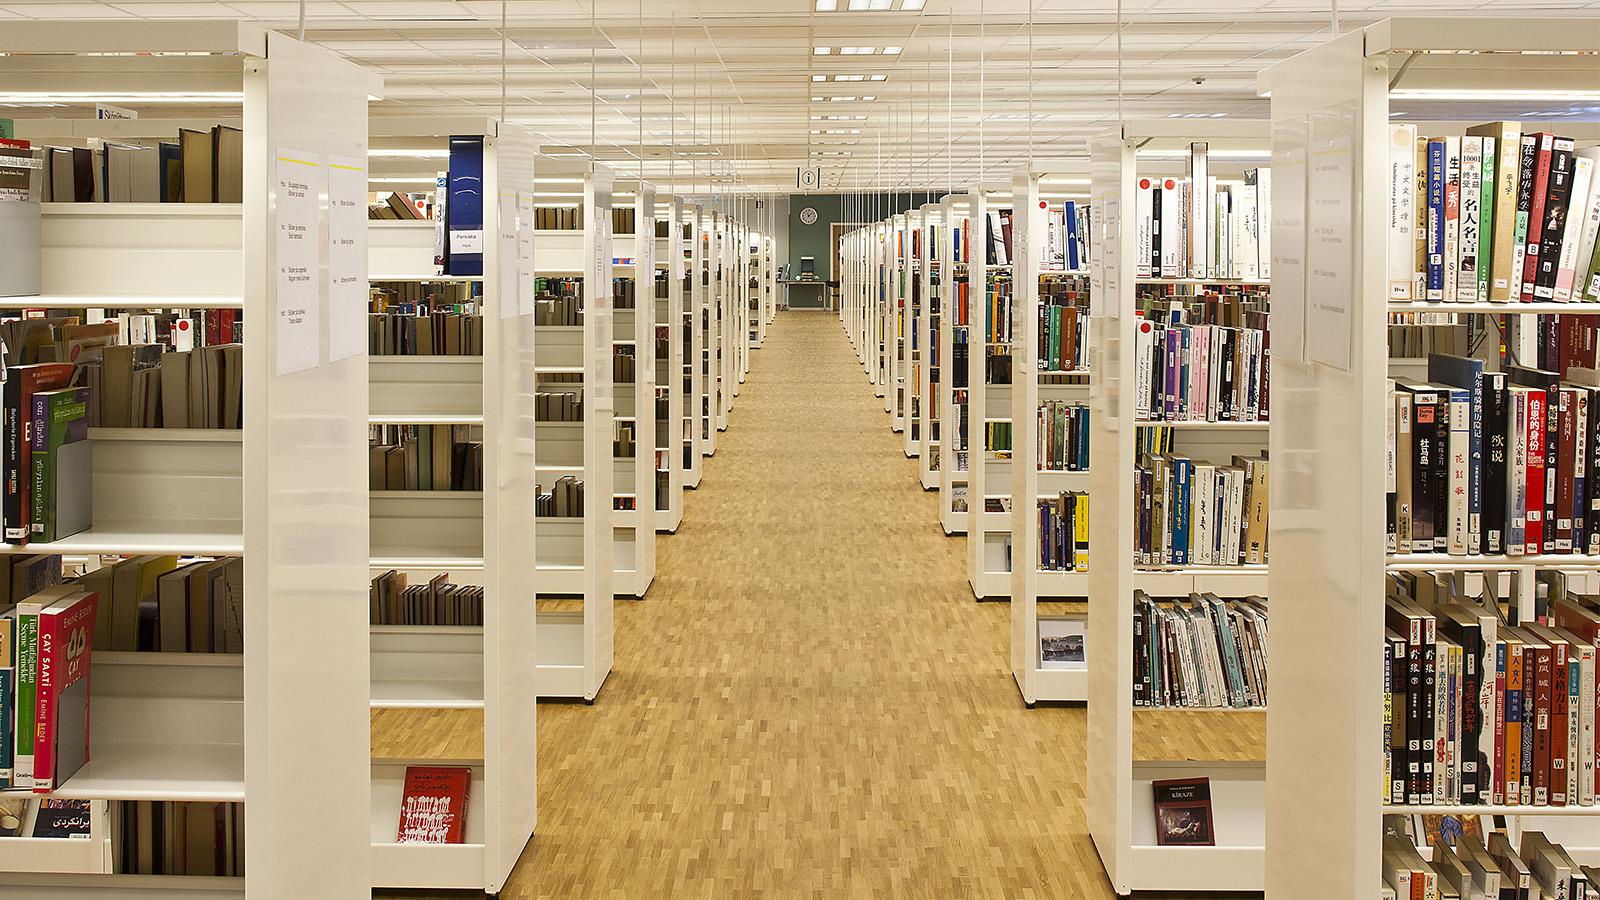 Borås stadsbibliotek